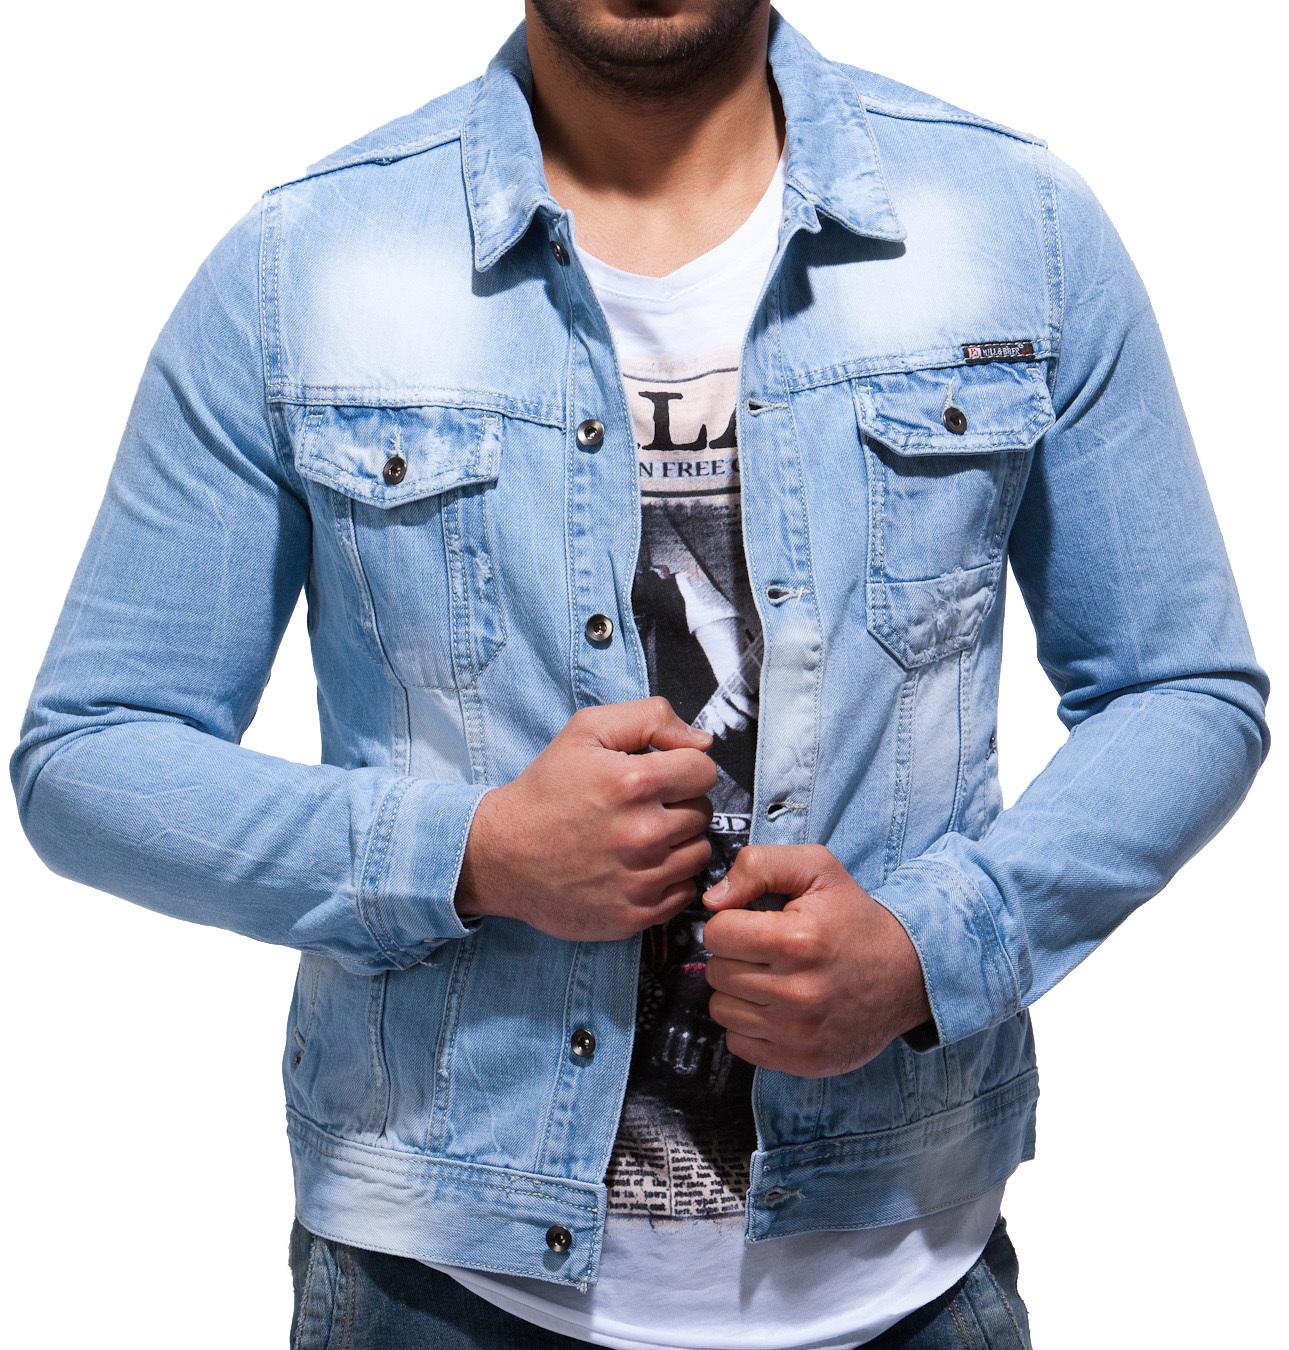 balandi herren jeans jeansjacke jacke denim sakko blazer neu style shirt 8002 ebay. Black Bedroom Furniture Sets. Home Design Ideas